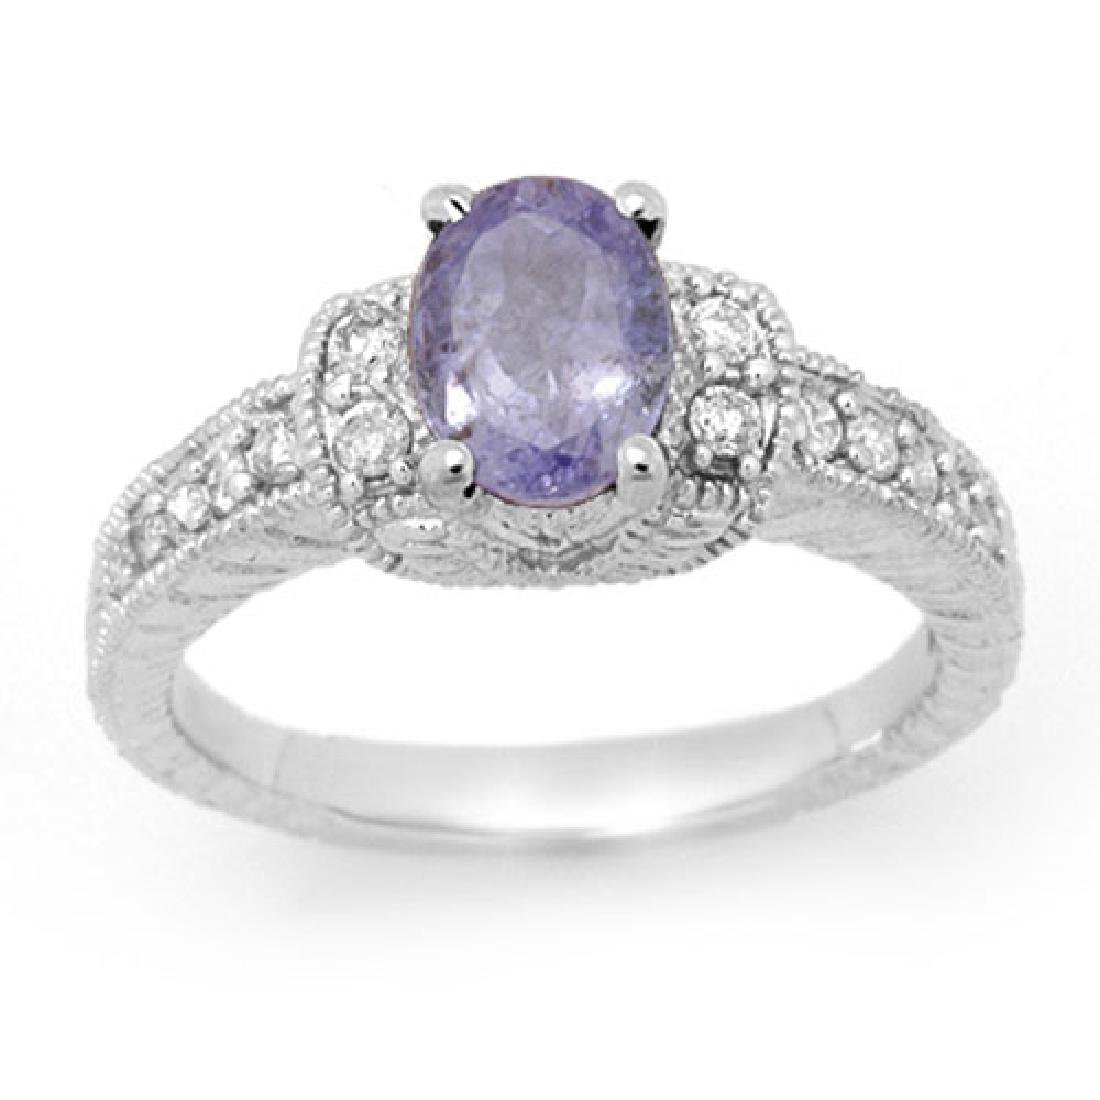 2.0 CTW Tanzanite & Diamond Ring 14K White Gold